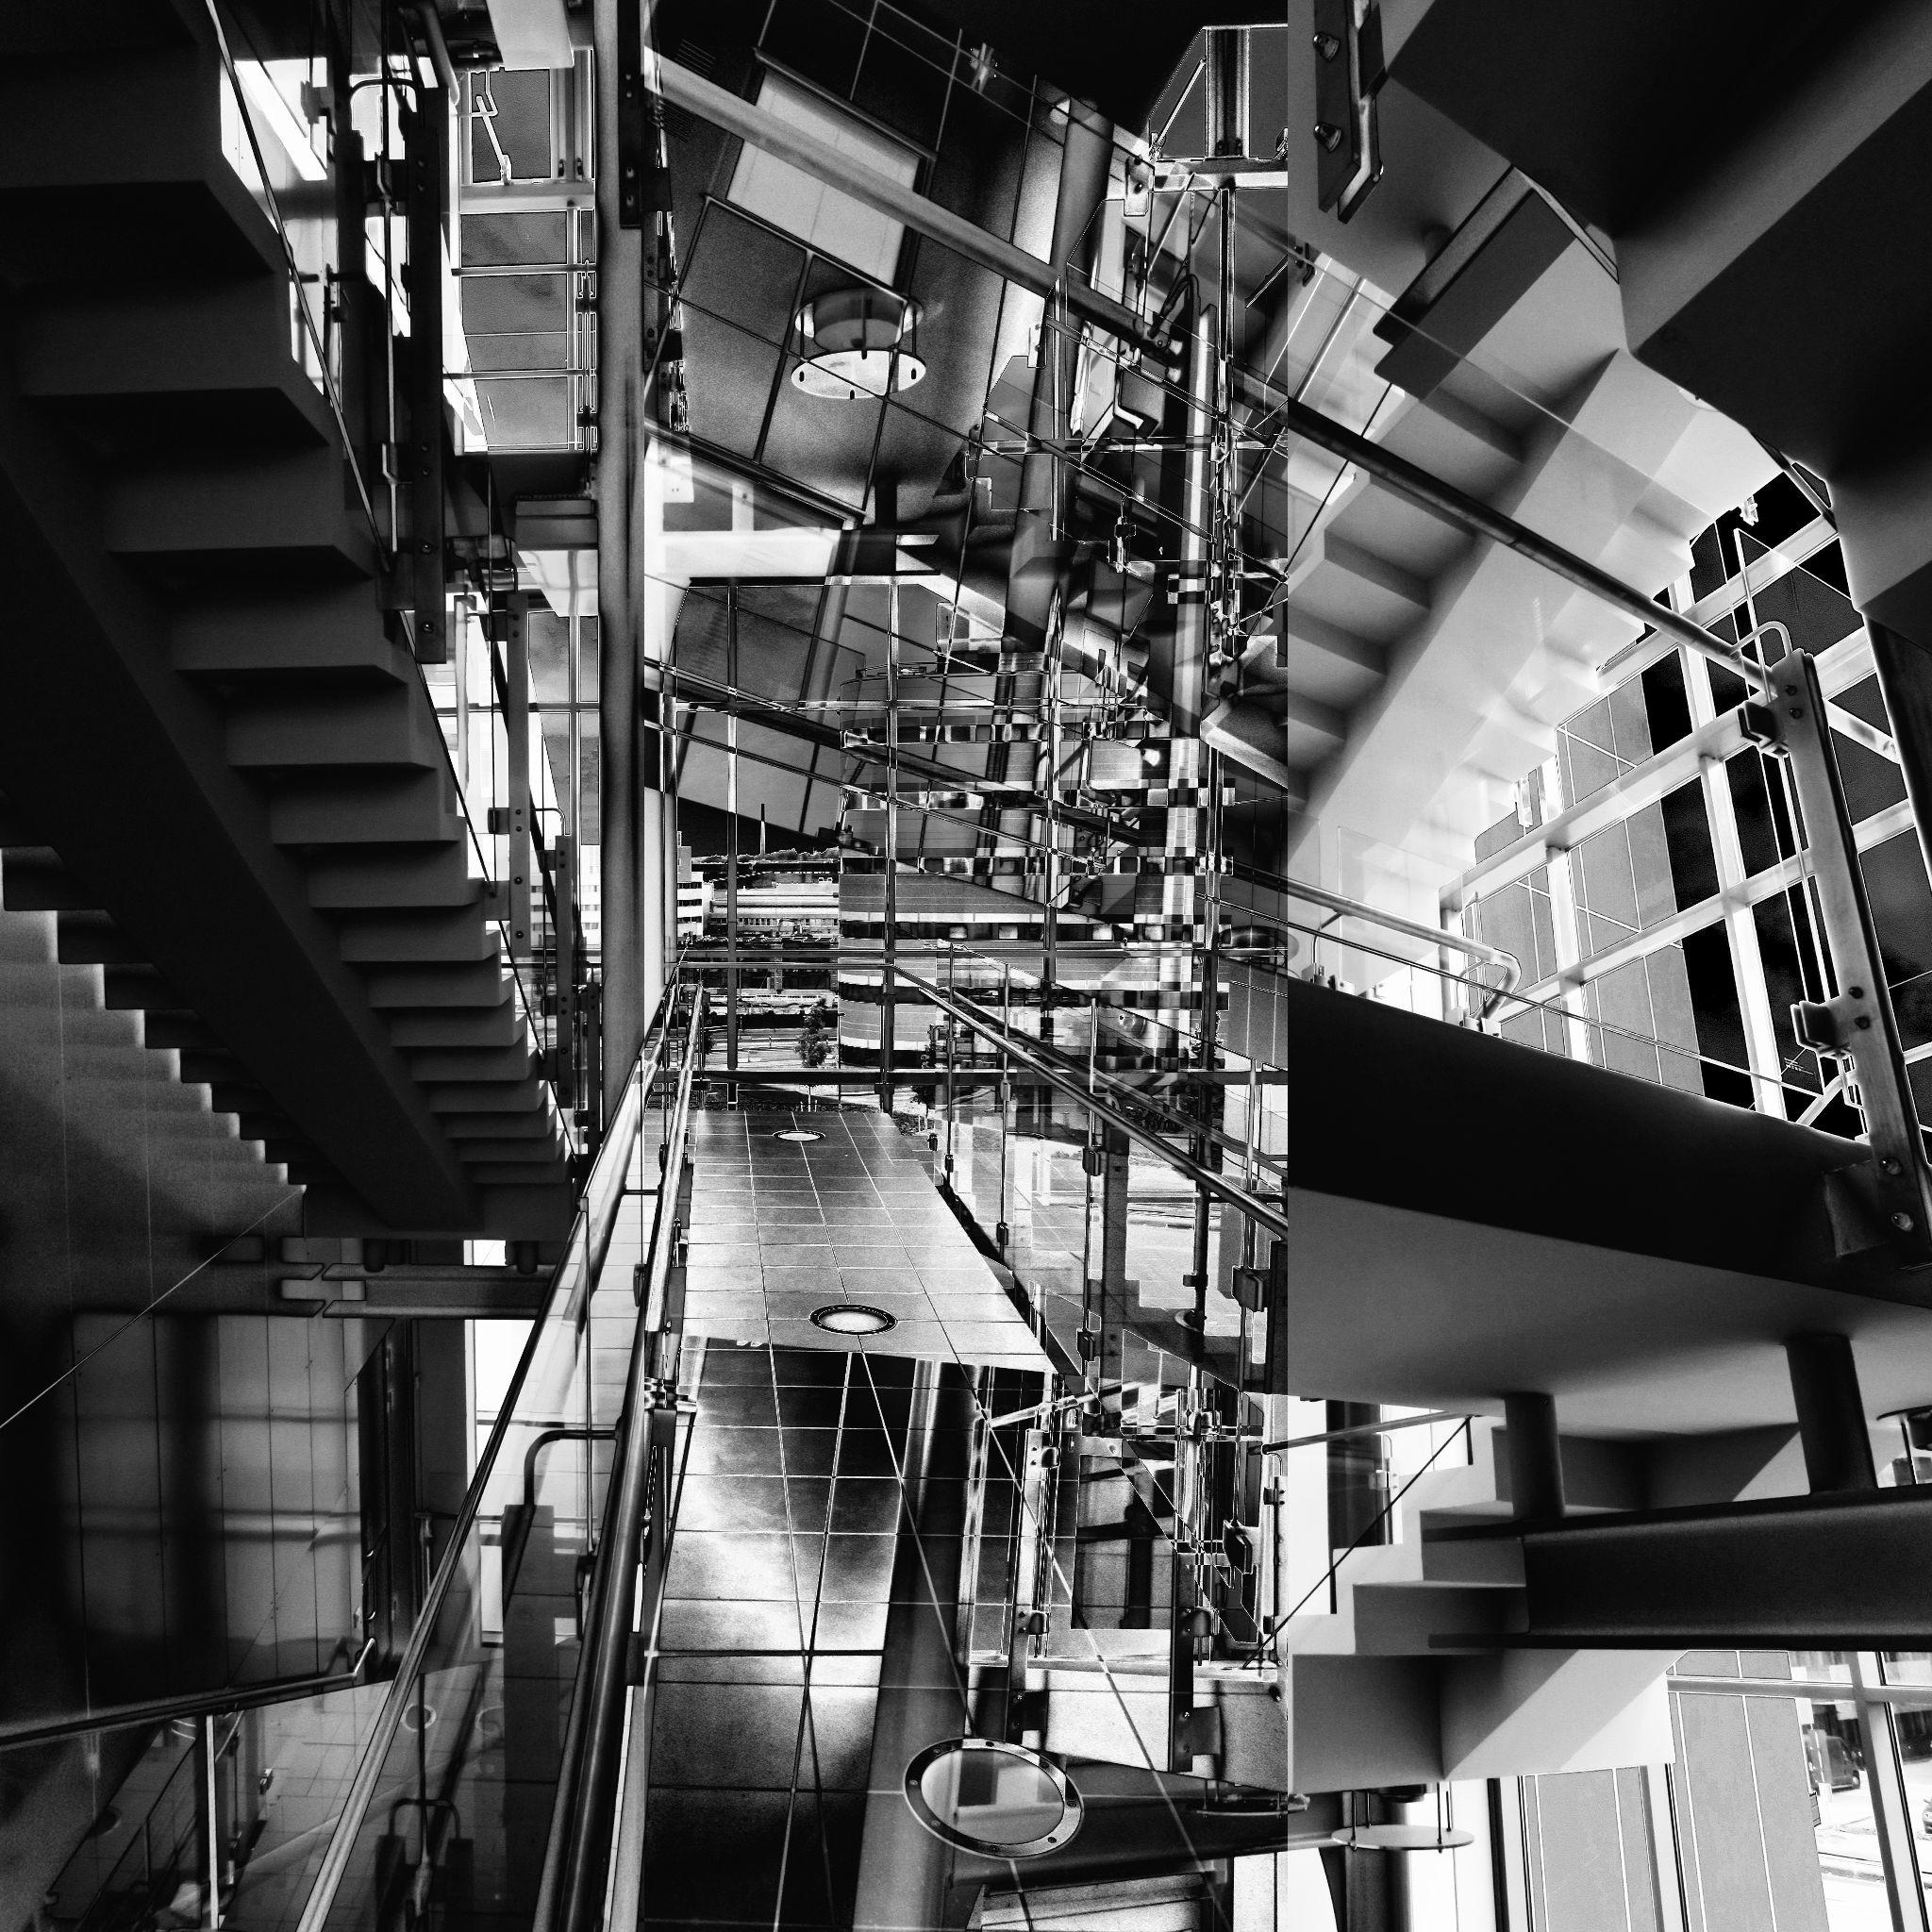 Staircase by Sami Serola